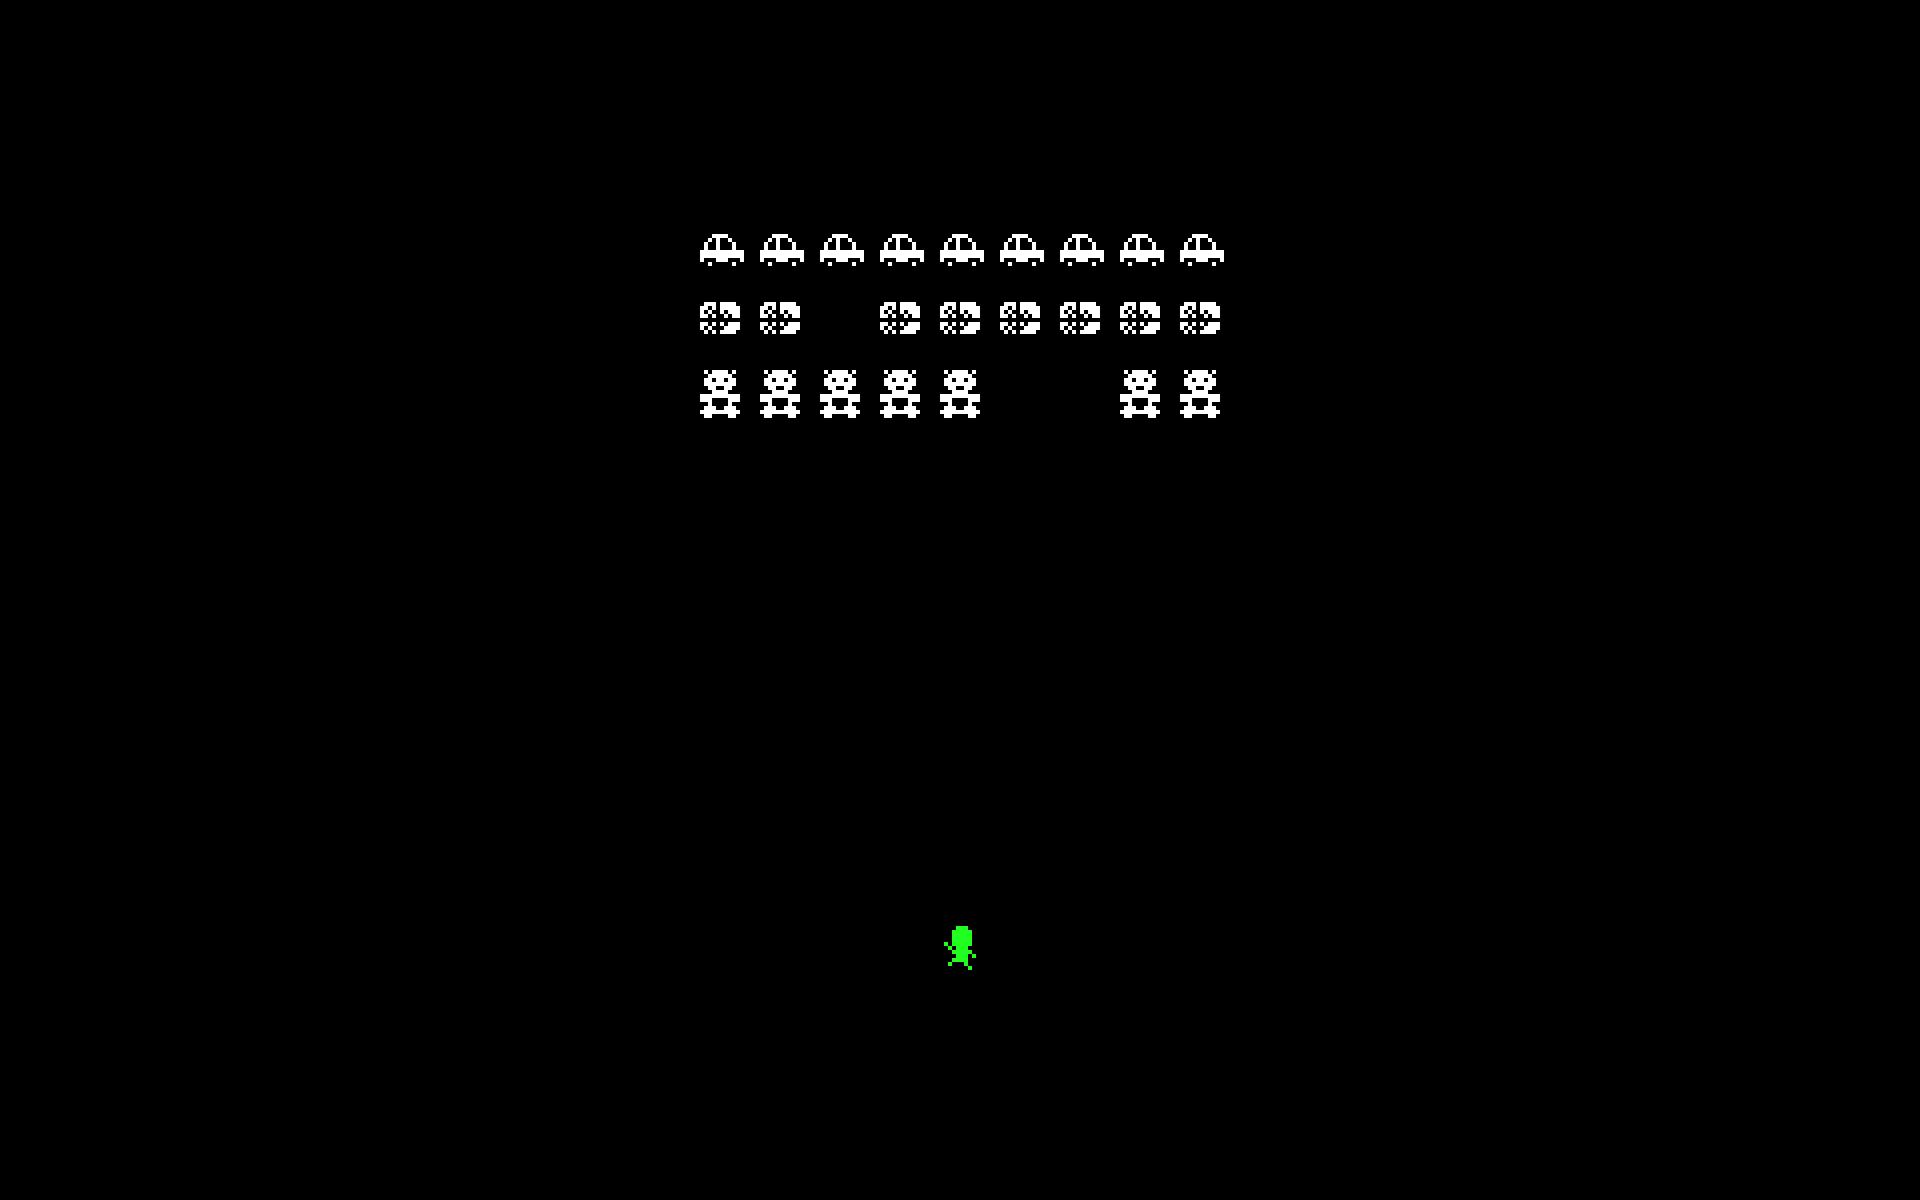 Retro Arcade Wallpaper Retro style action game 1920x1200